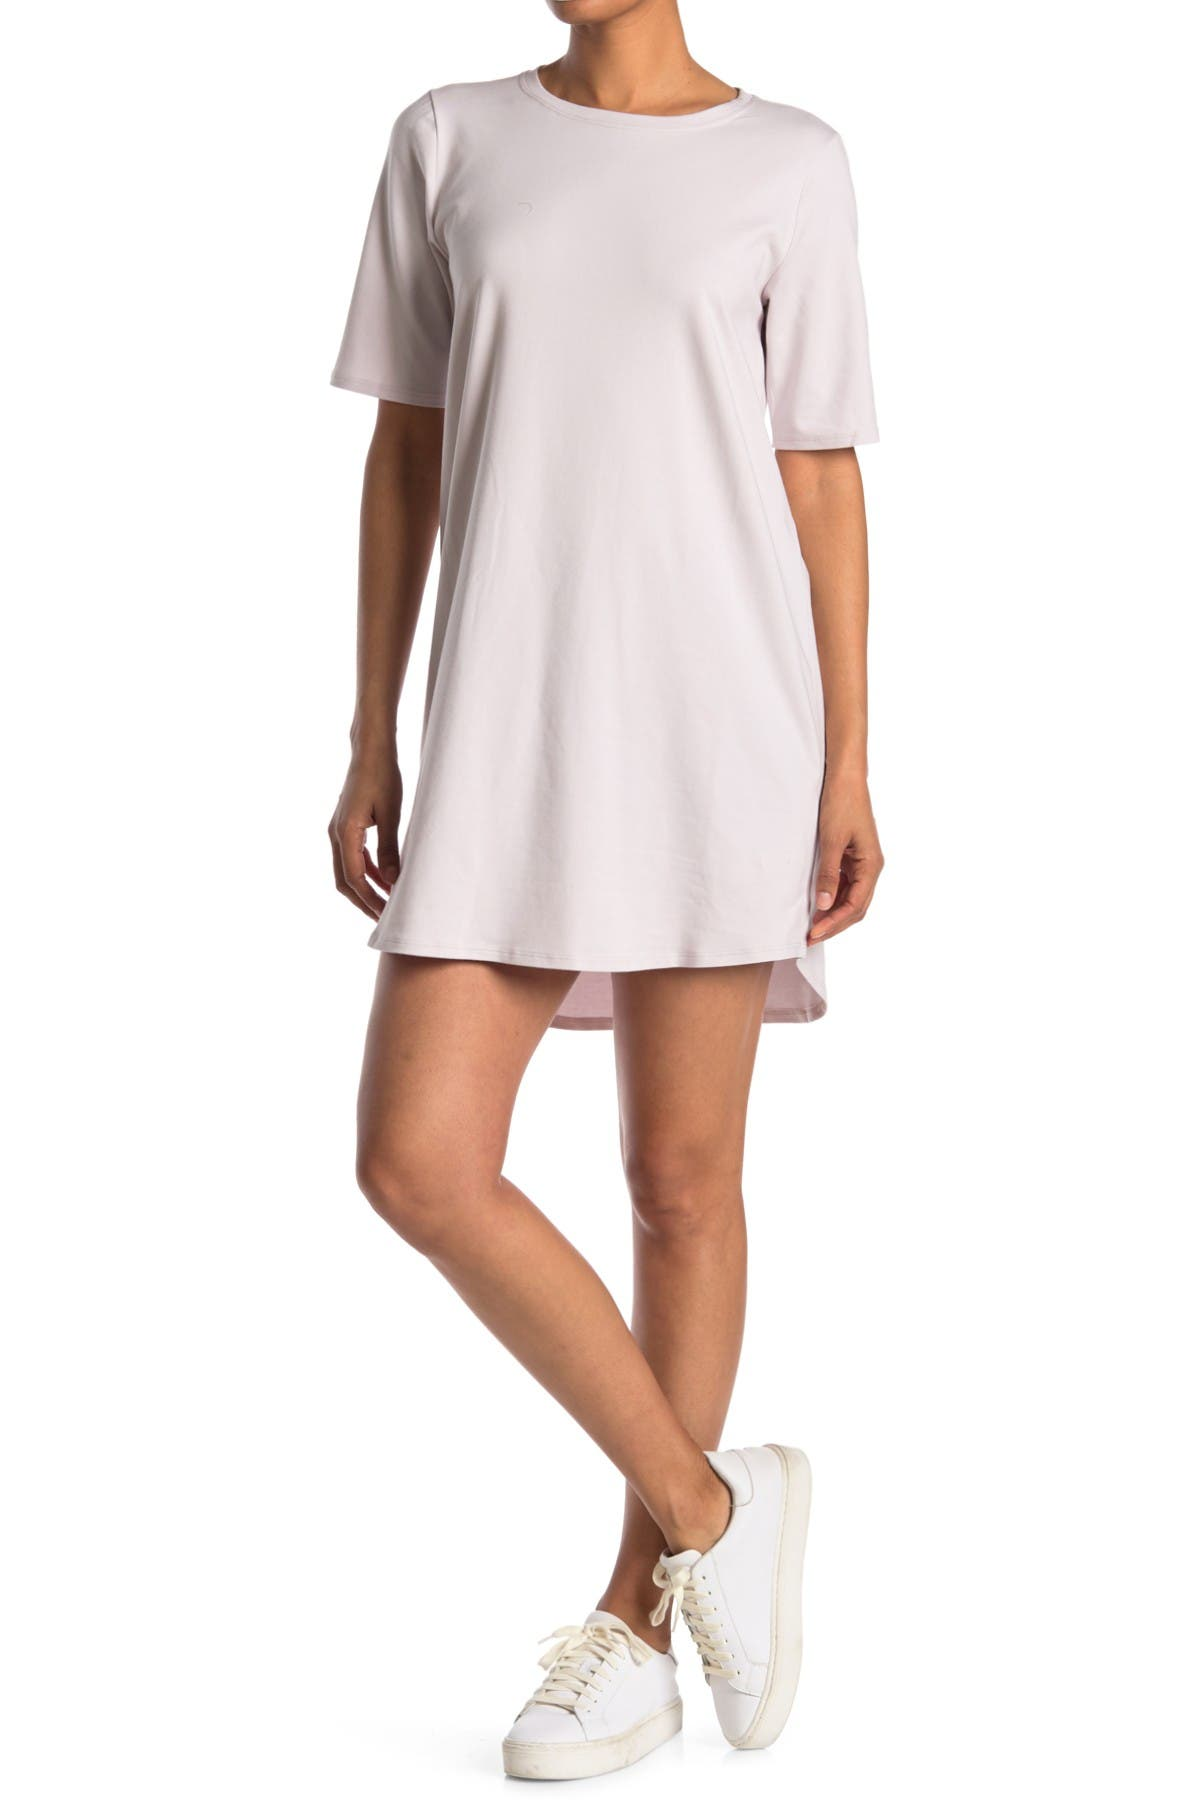 Image of Eileen Fisher Crew Neck Short Sleeve T-Shirt Dress